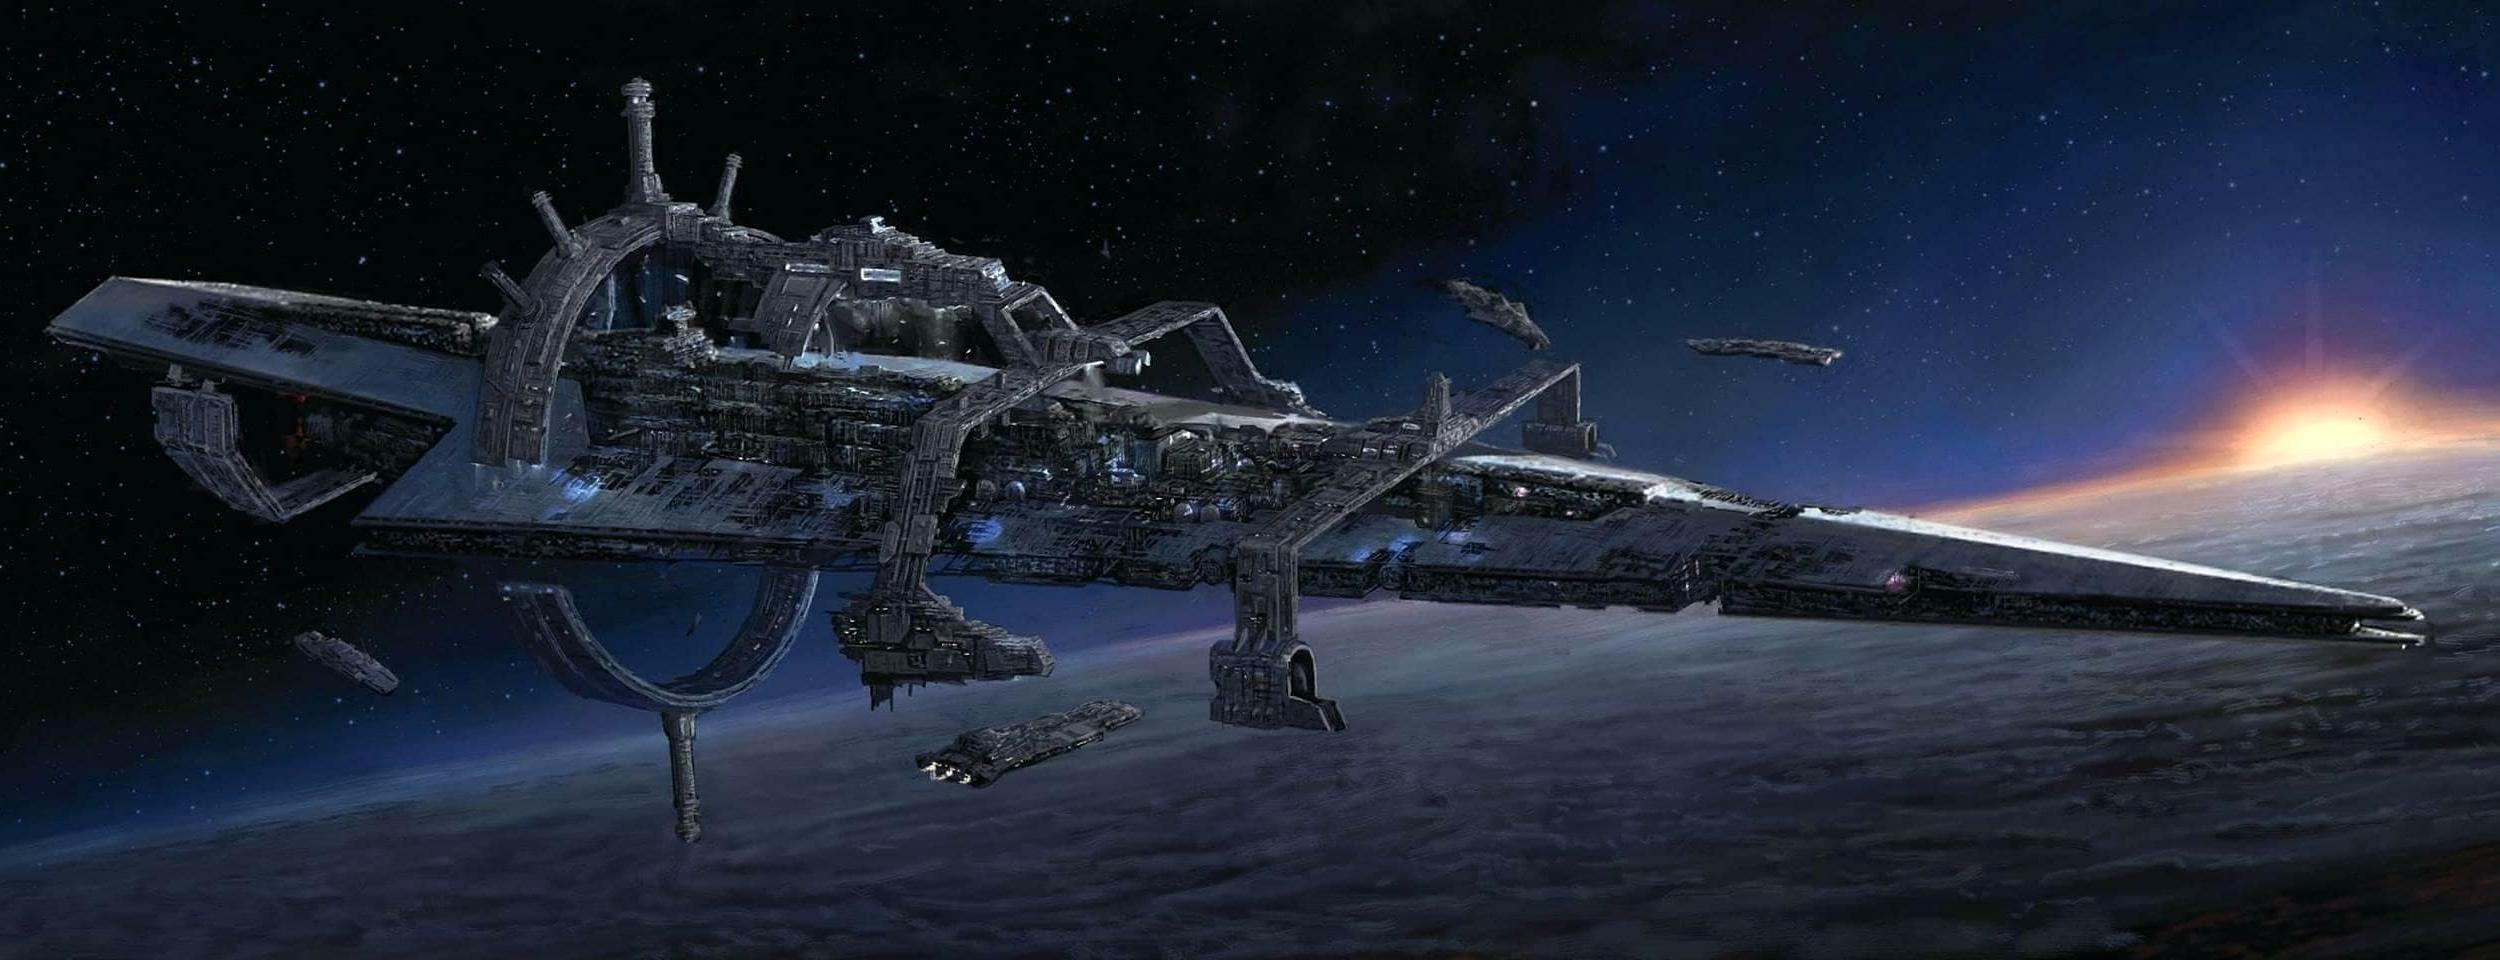 Executor Class Star Dreadnought Wookieepedia Fandom